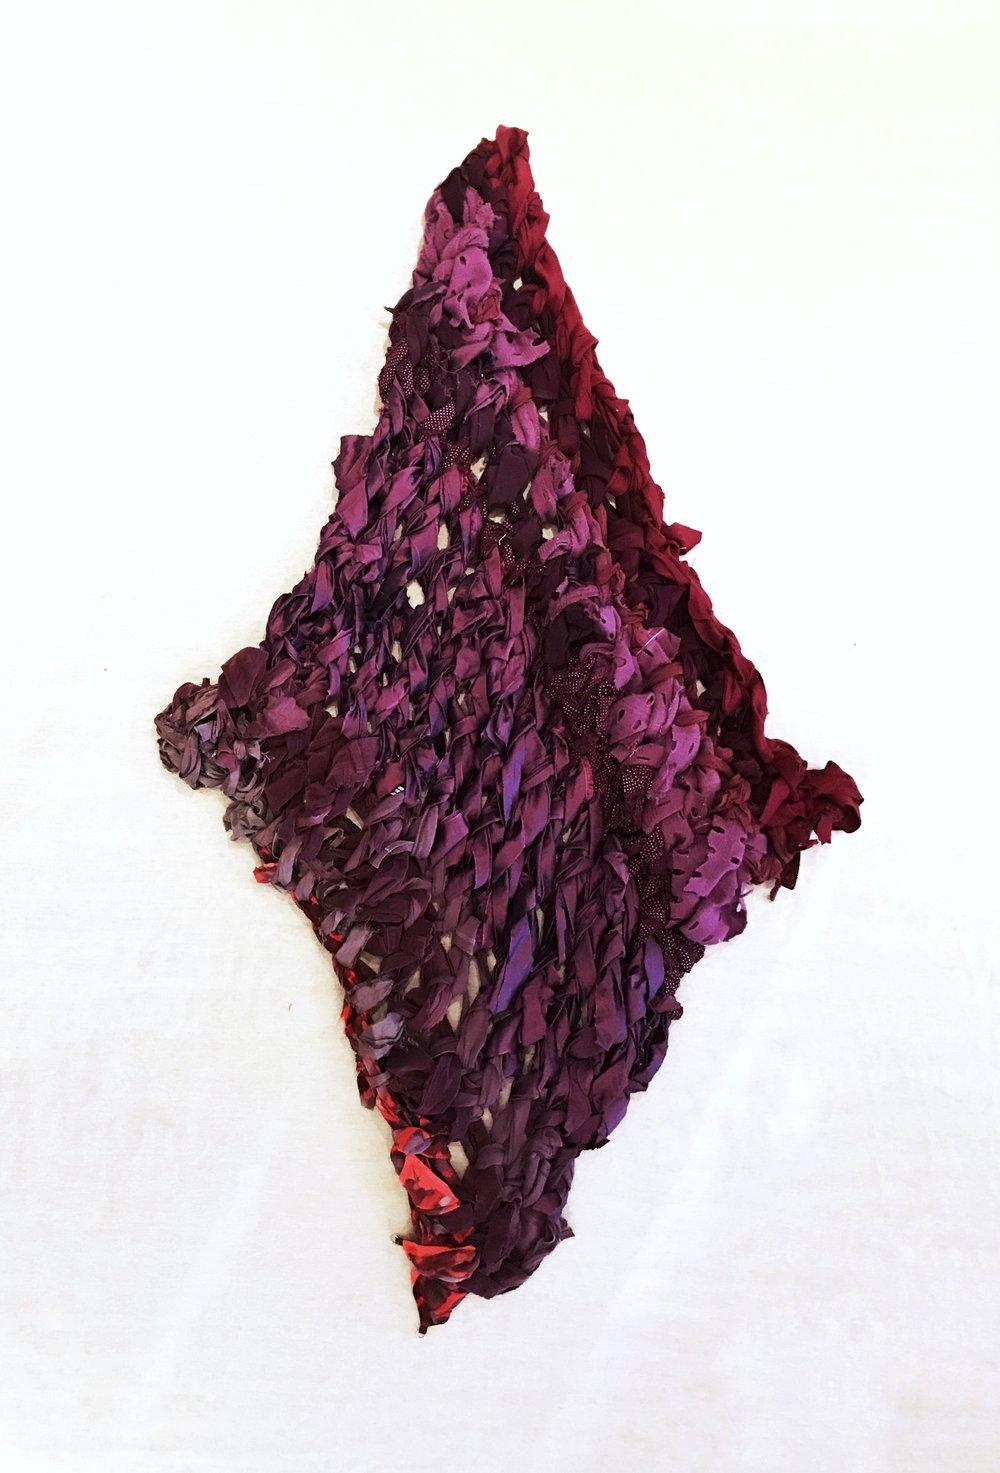 purplediamondknittedform.jpg